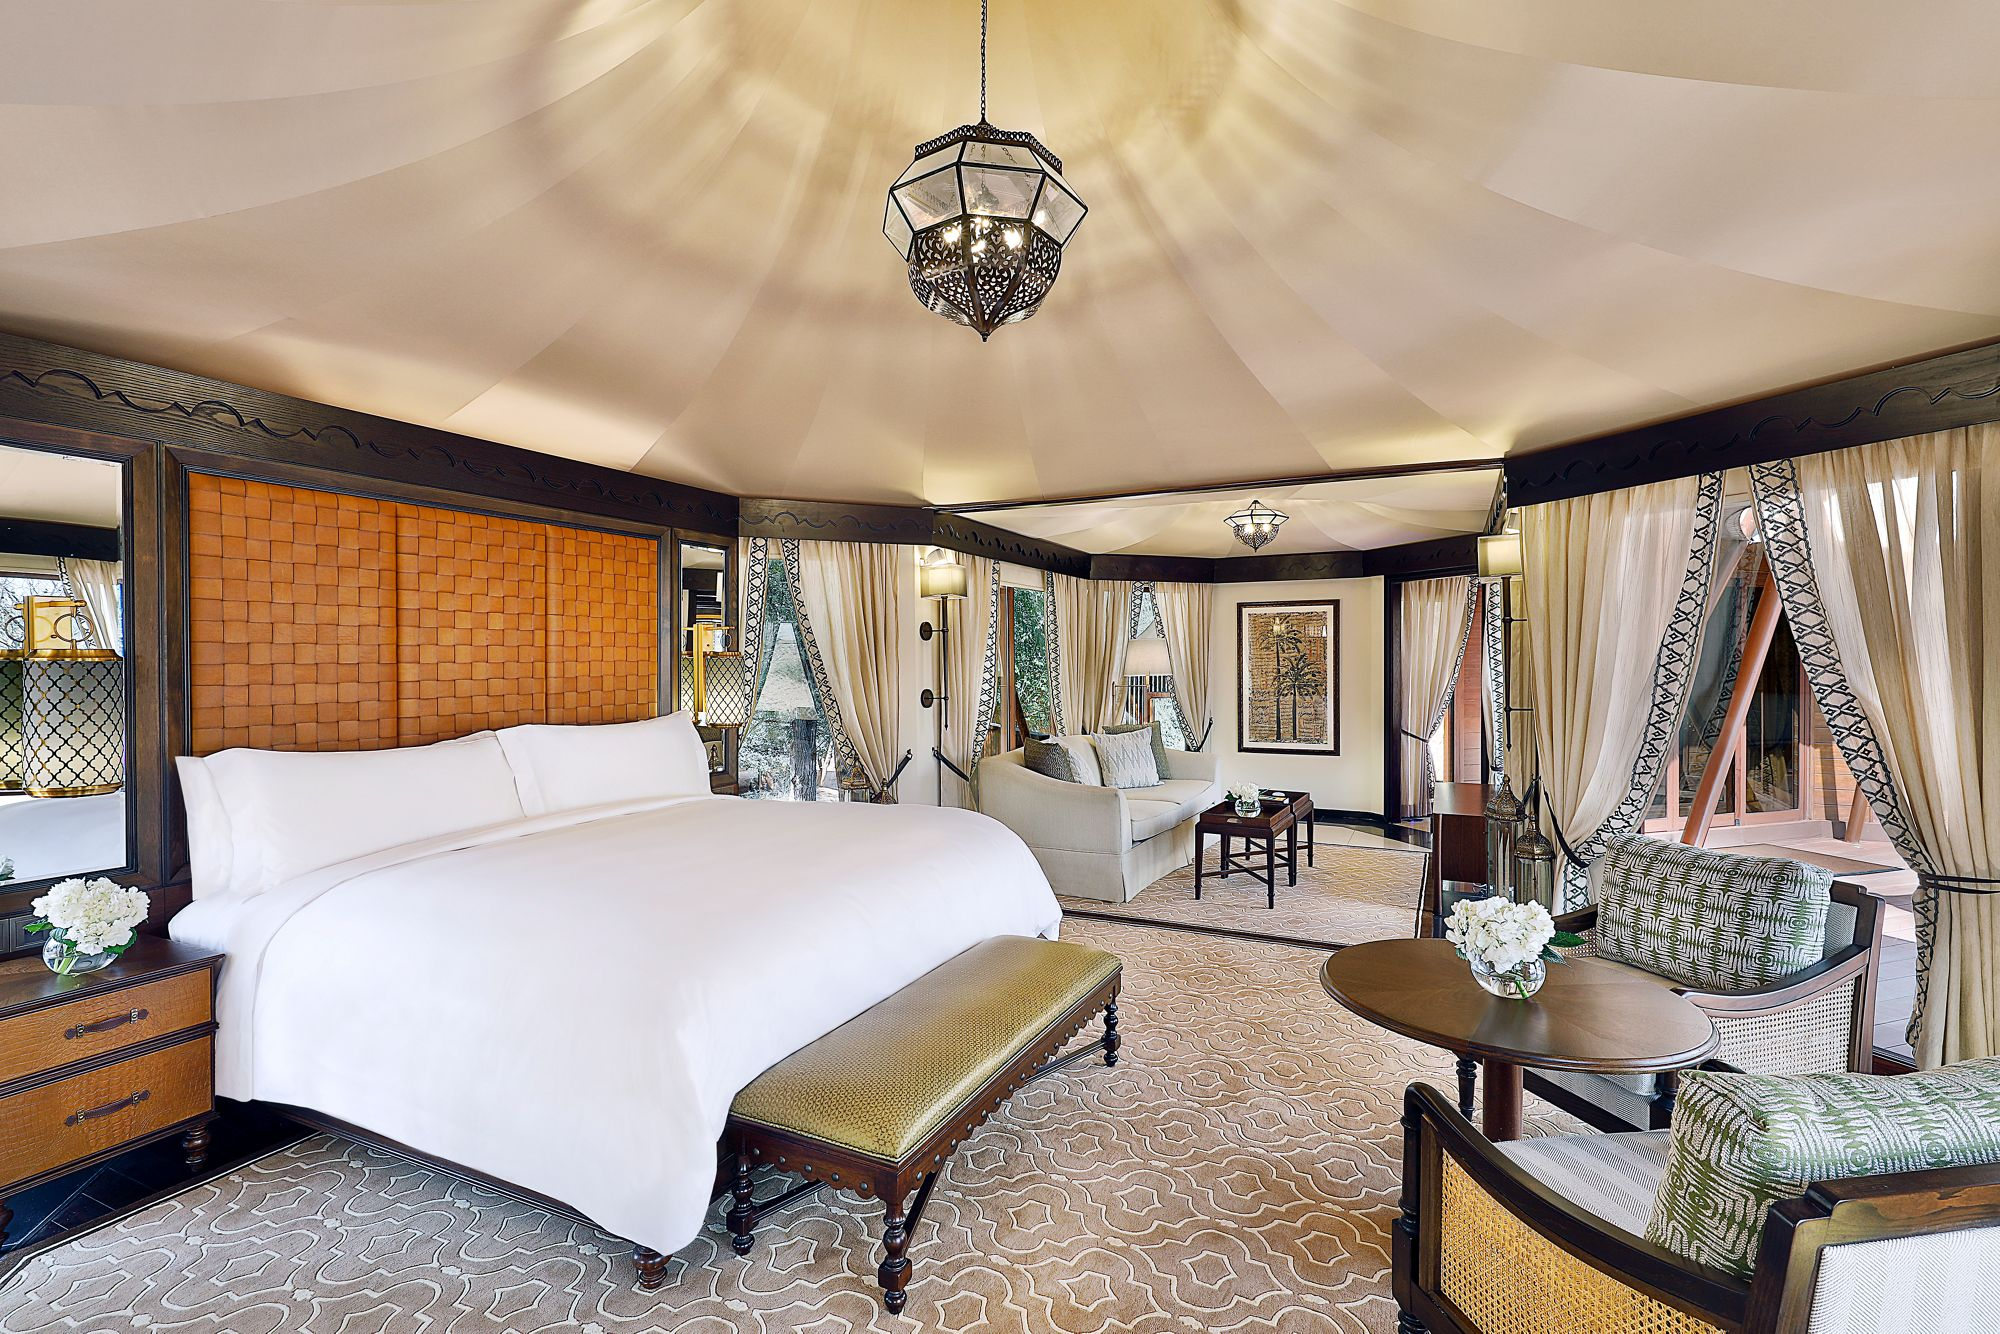 ritz-carlton-al-wadi-tent-suite